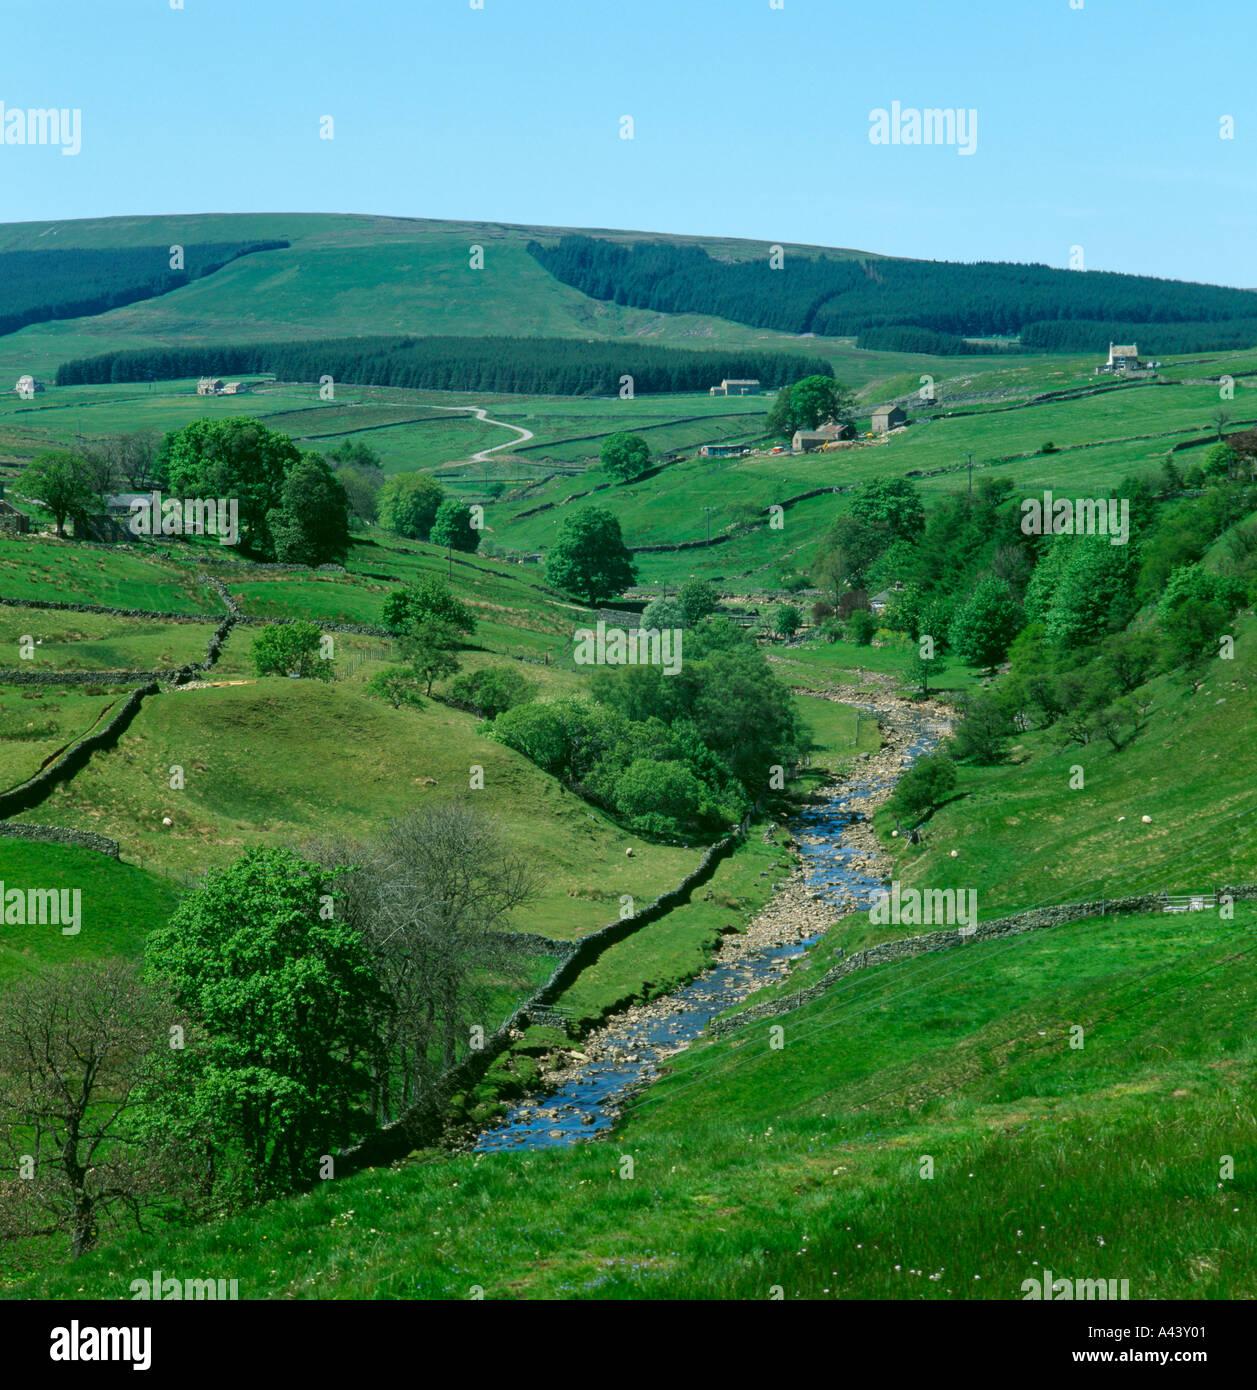 V Shaped River Valley Stock Photos Amp V Shaped River Valley